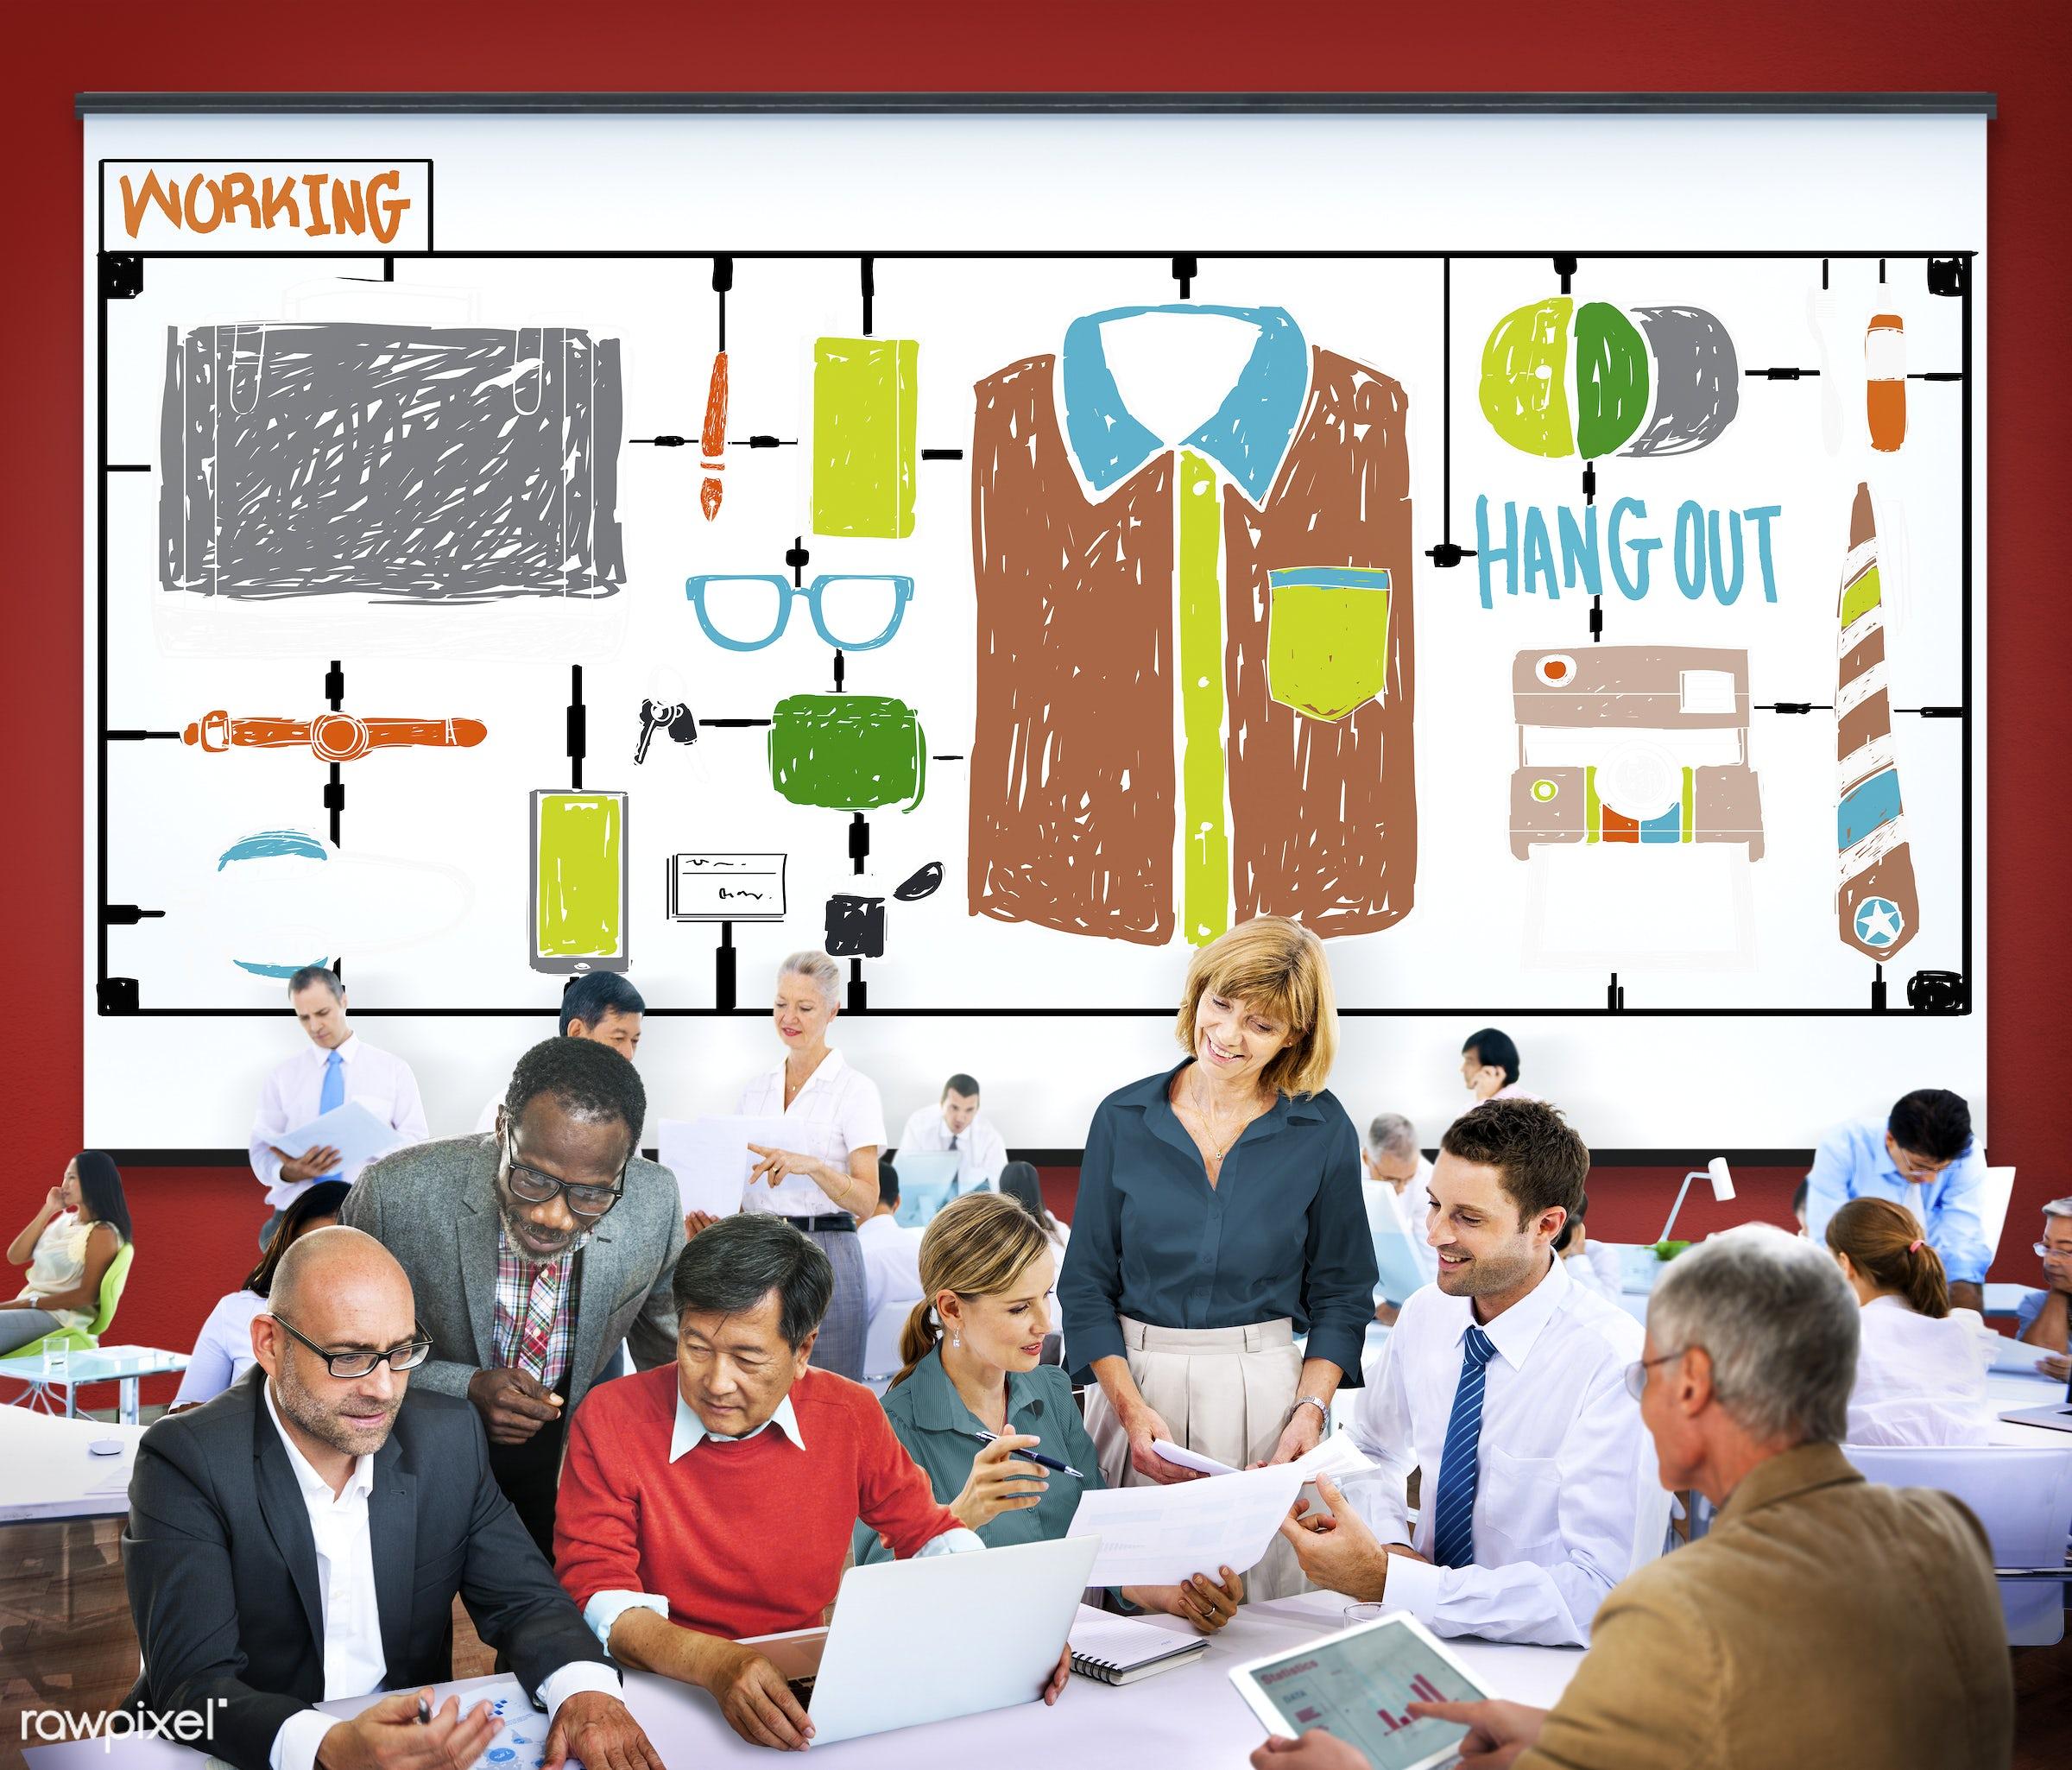 analysis, boss, business, business people, businessmen, businesswomen, busy, cloth, communication, conversation, corporate,...